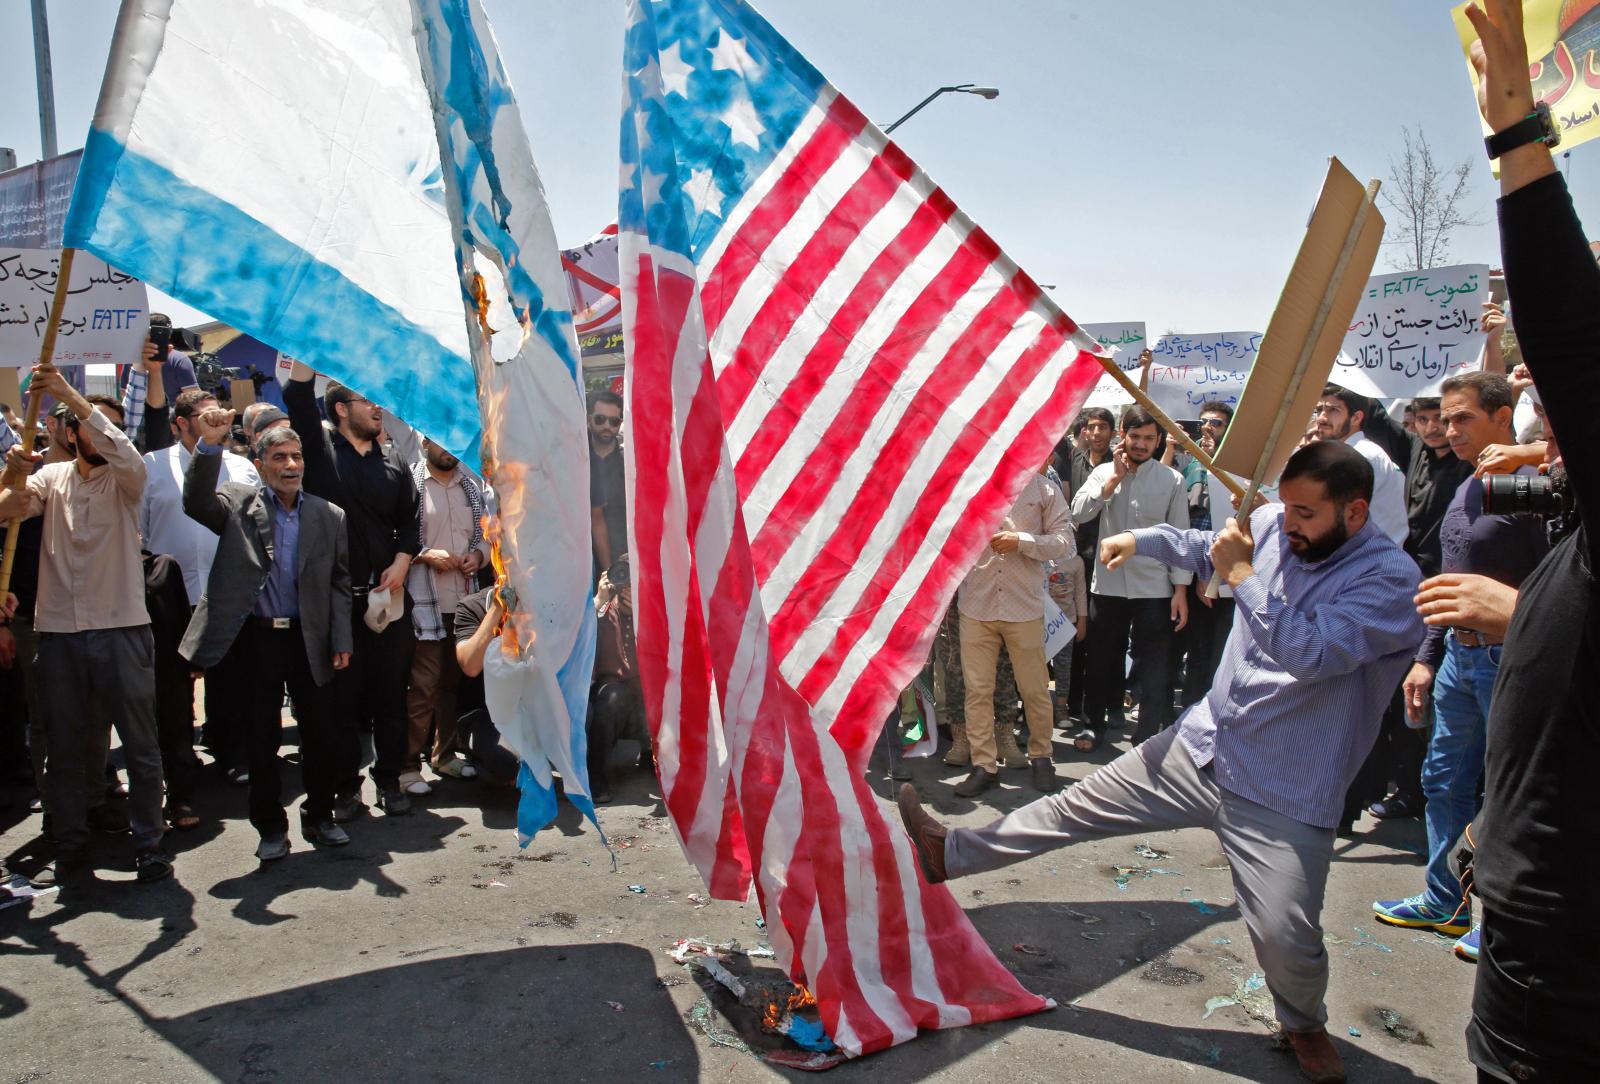 Iran demonstrations against Israel